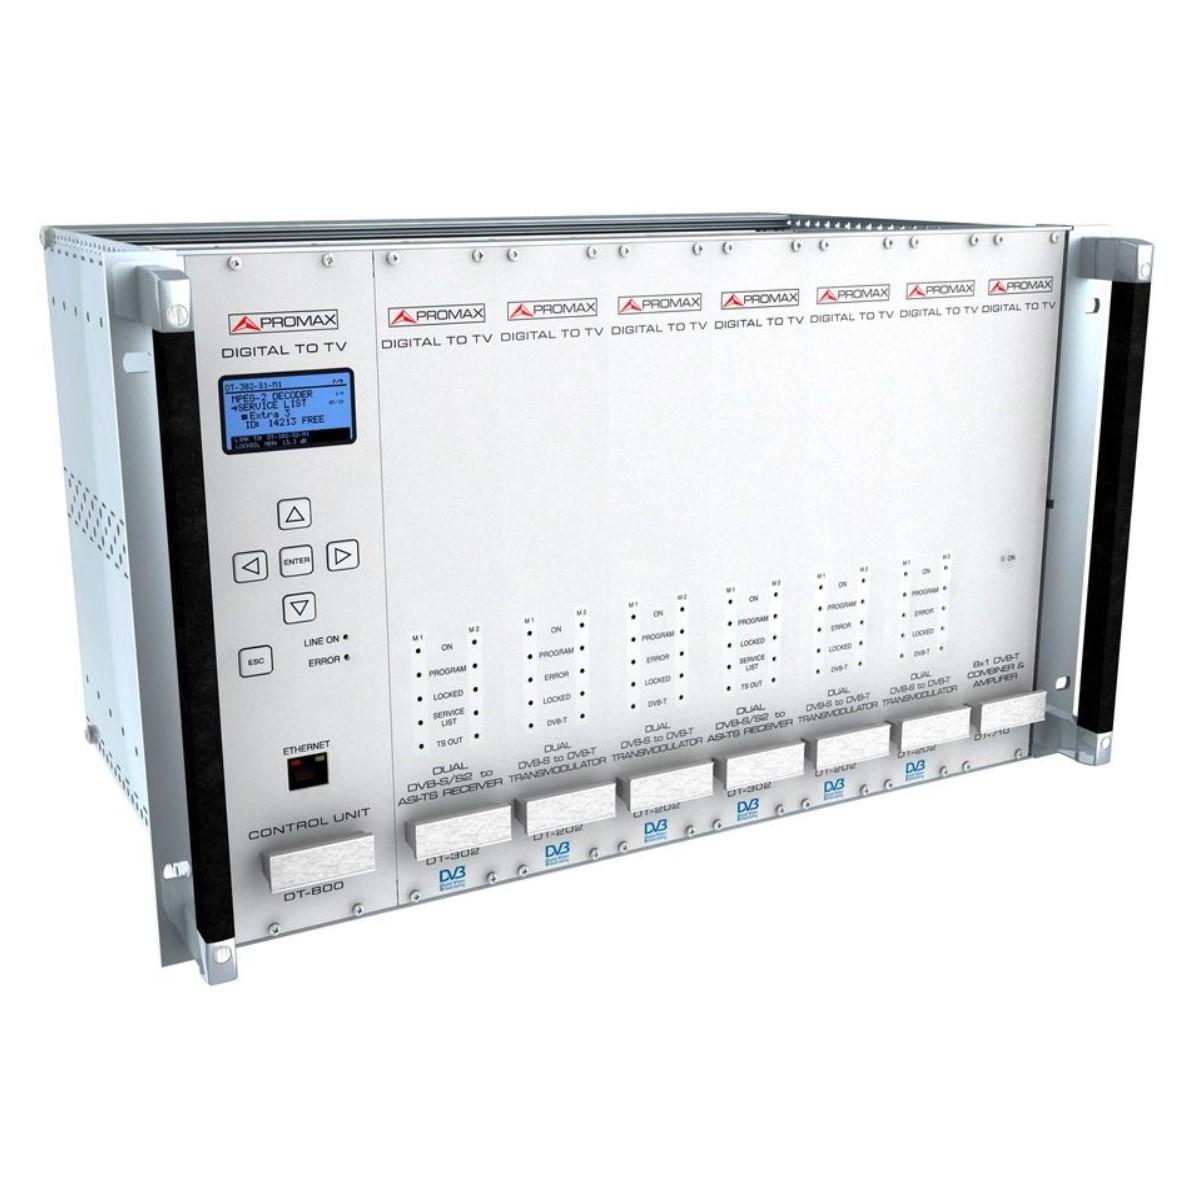 Amplificador de potencia de 30 dBm DVB-T 1 W ProMax DT-730